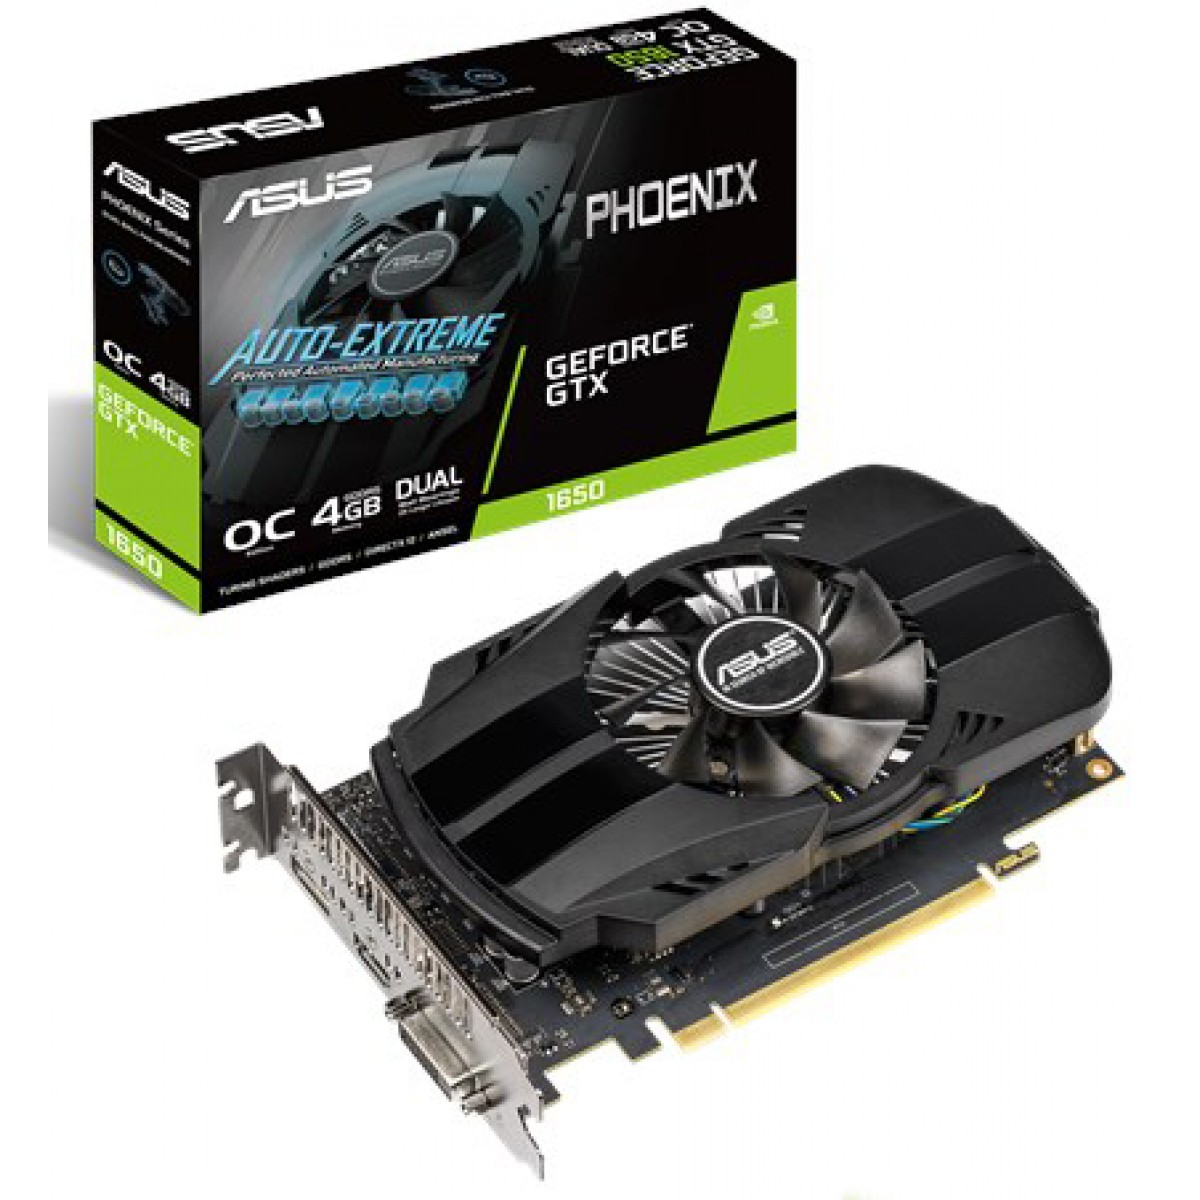 Placa De Video Asus Geforce GTX 1650 4GB GDDR5 OC Phoenix 128-BIT PH-GTX1650-O4G